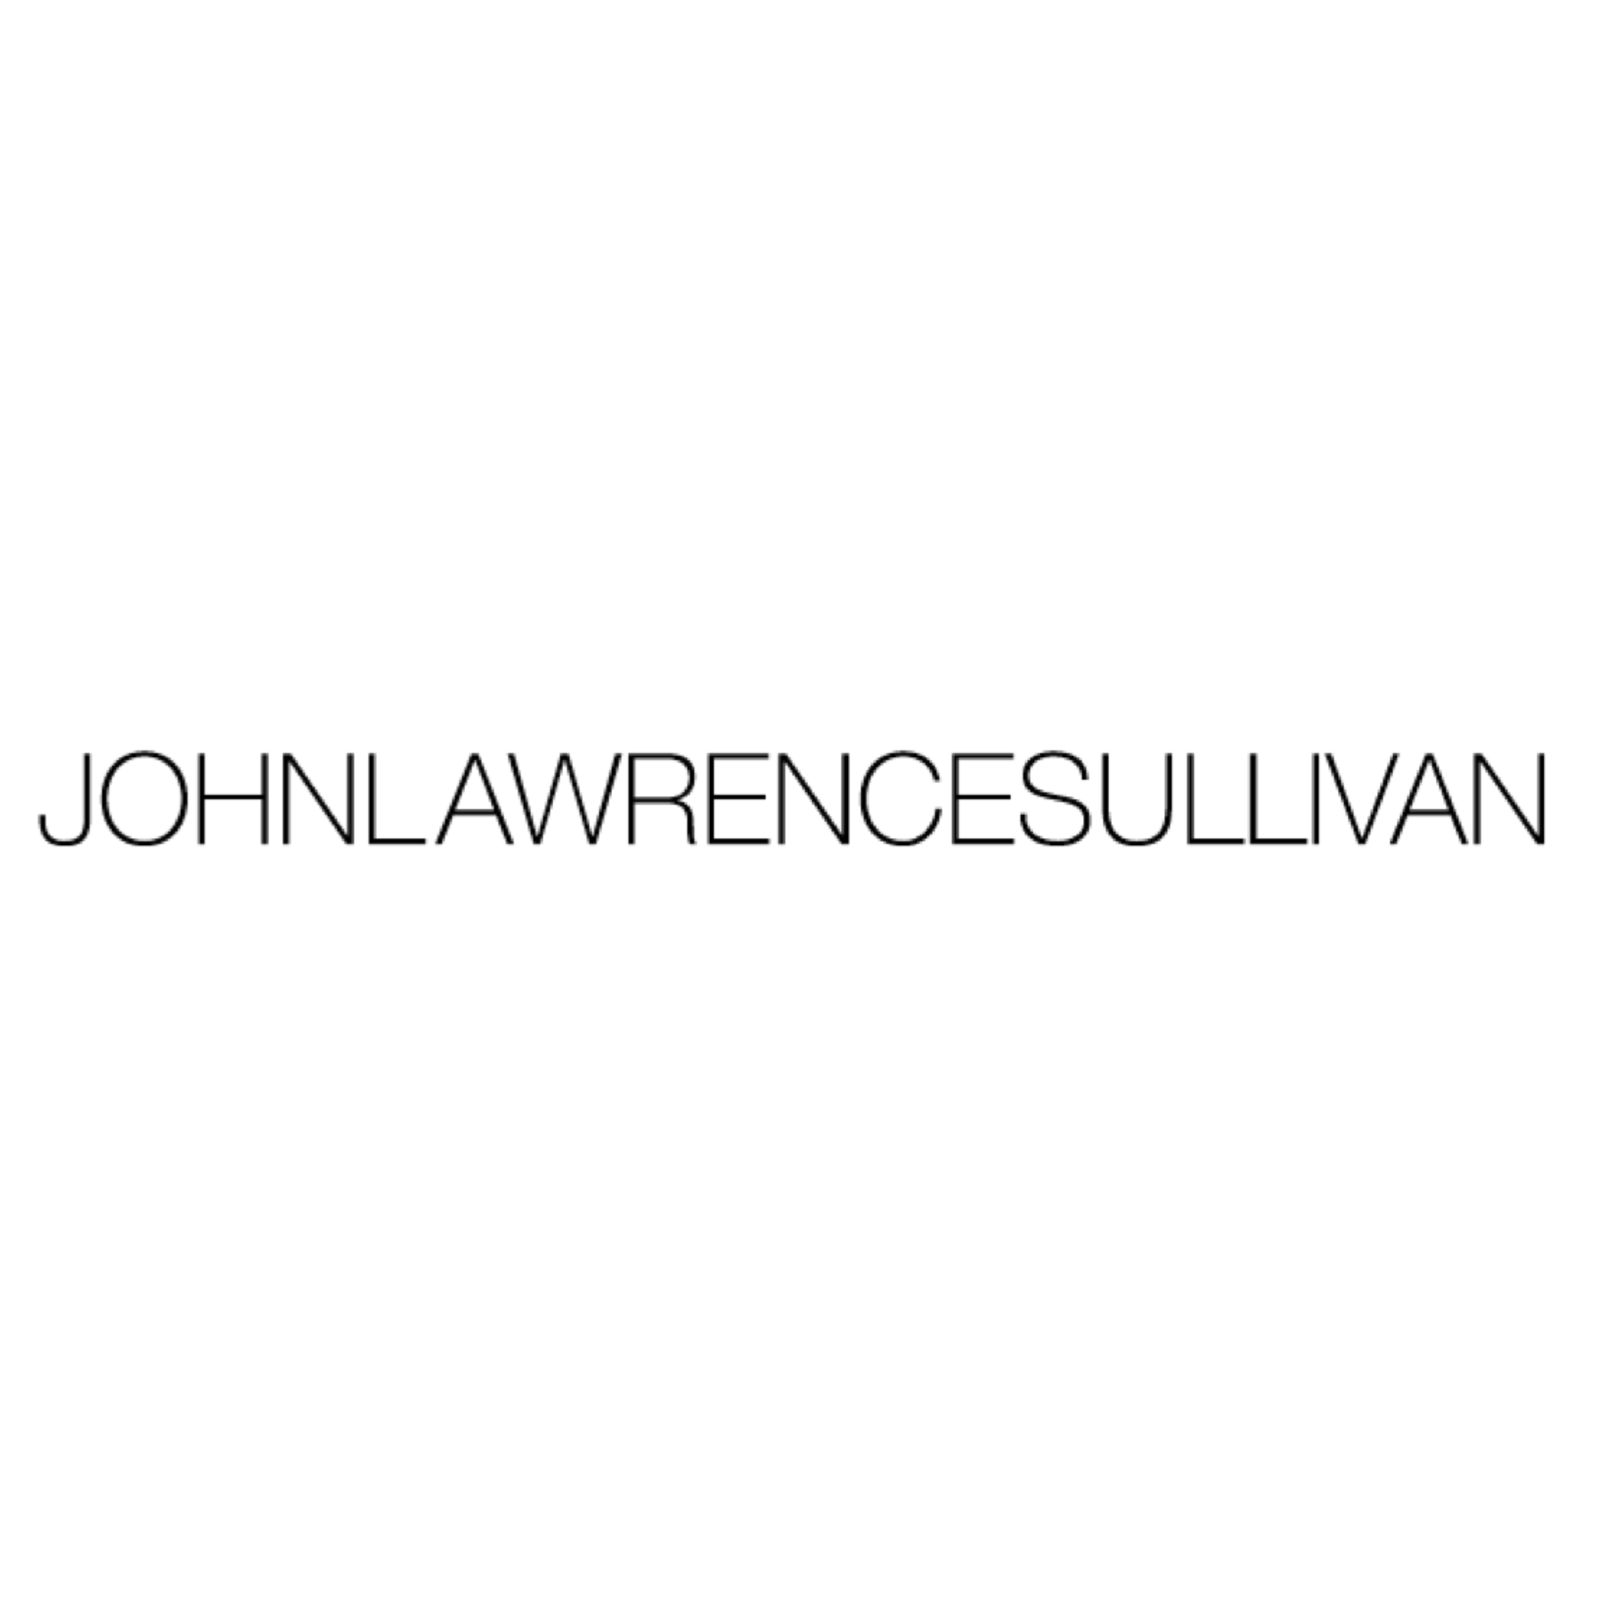 JOHN LAWRENCE SULLIVAN (Image 1)